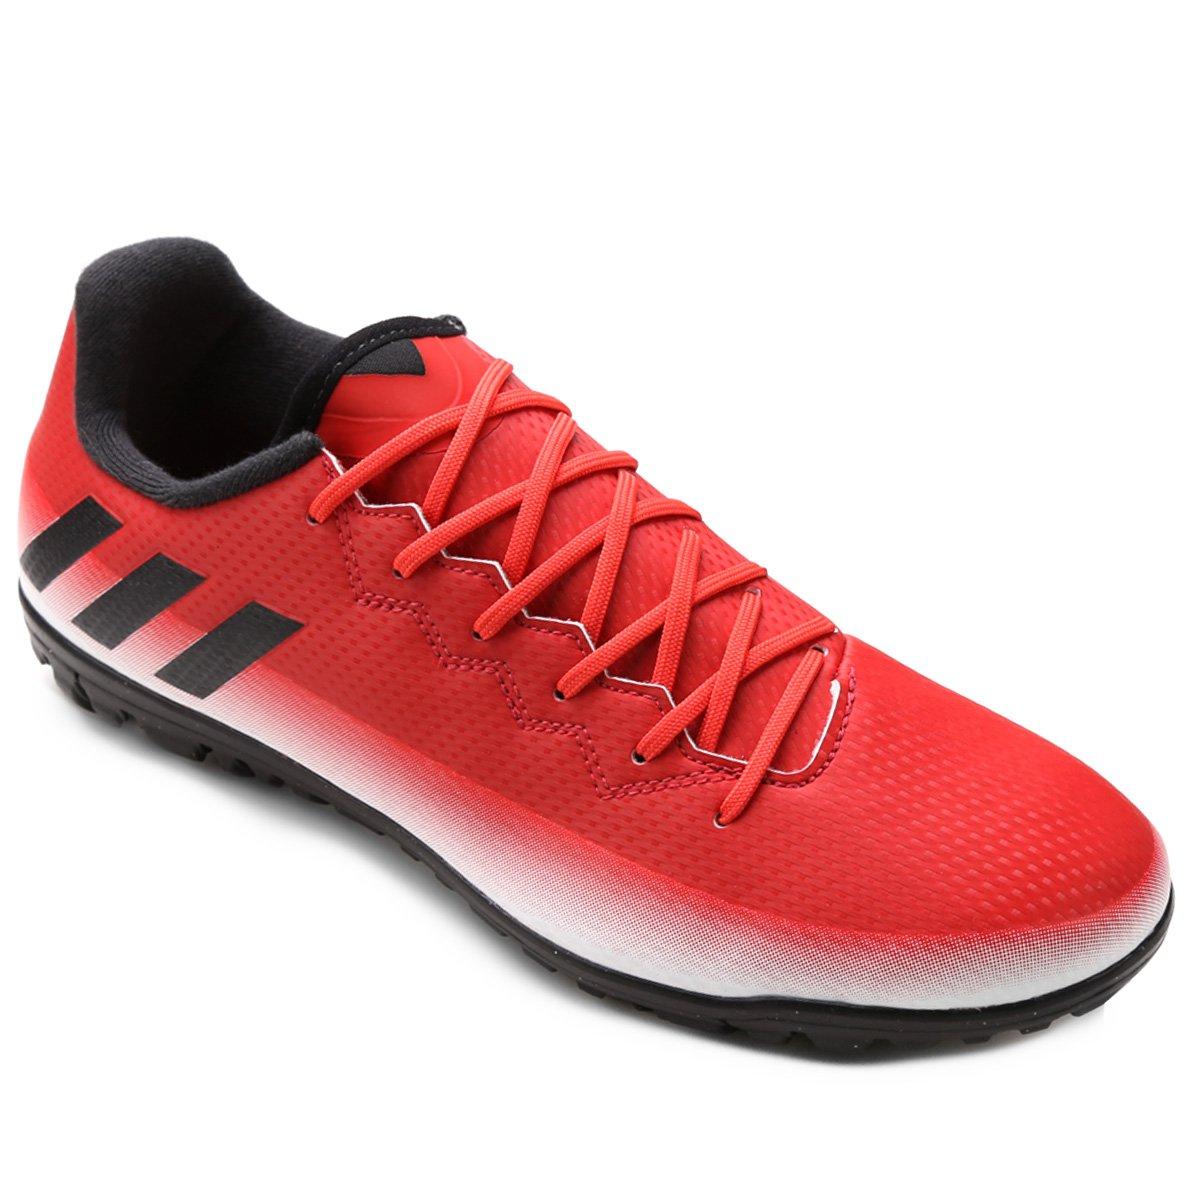 d0d8bffe9de4f Chuteira Society Adidas Messi 16.3 TF Masculina - Compre Agora ...